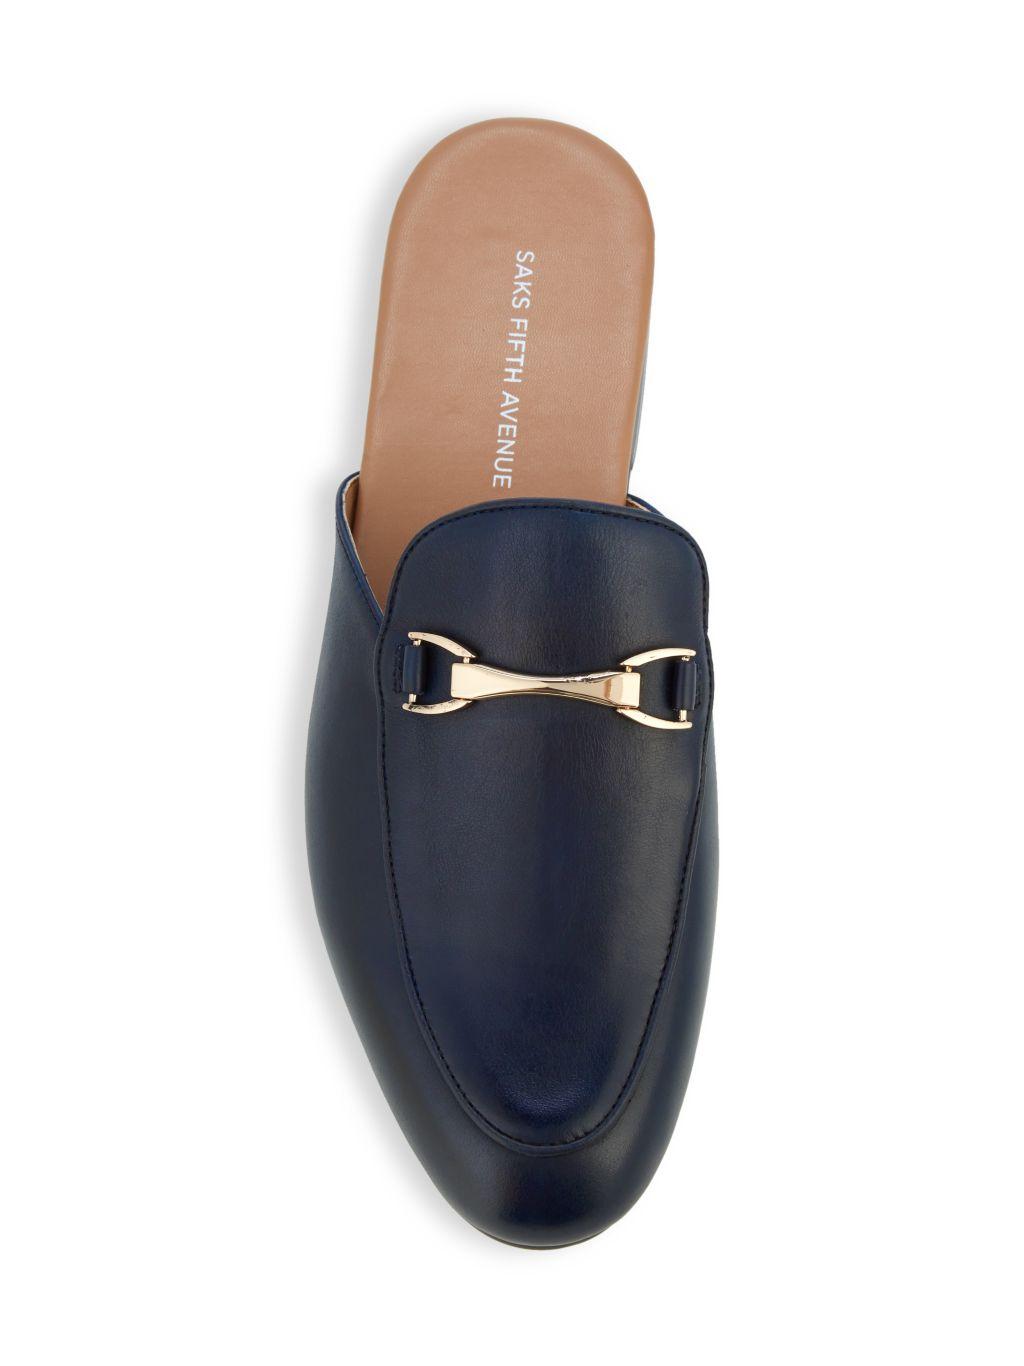 Saks Fifth Avenue Ronan Leather Mules